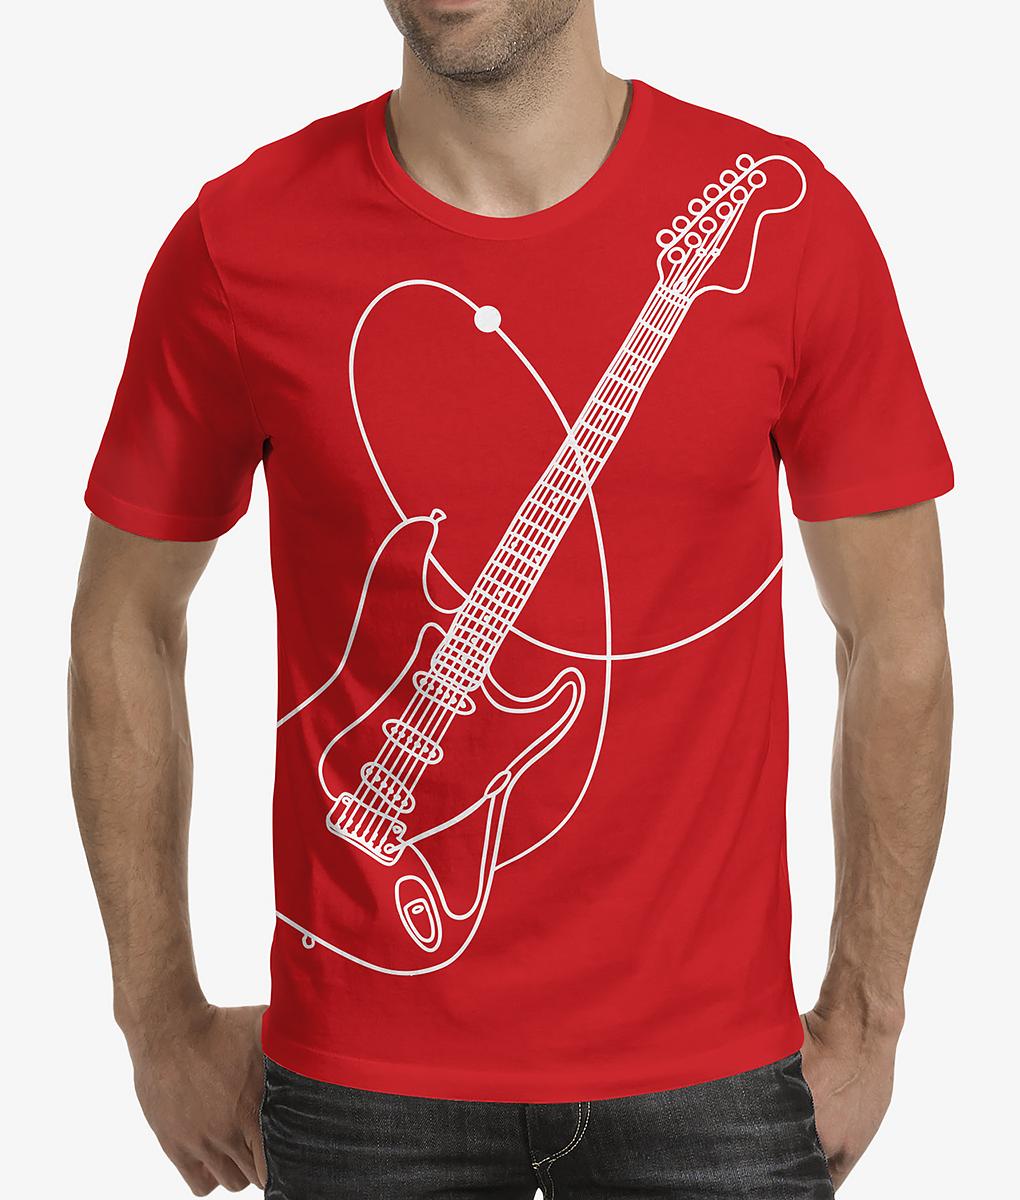 t-shirt_man_3